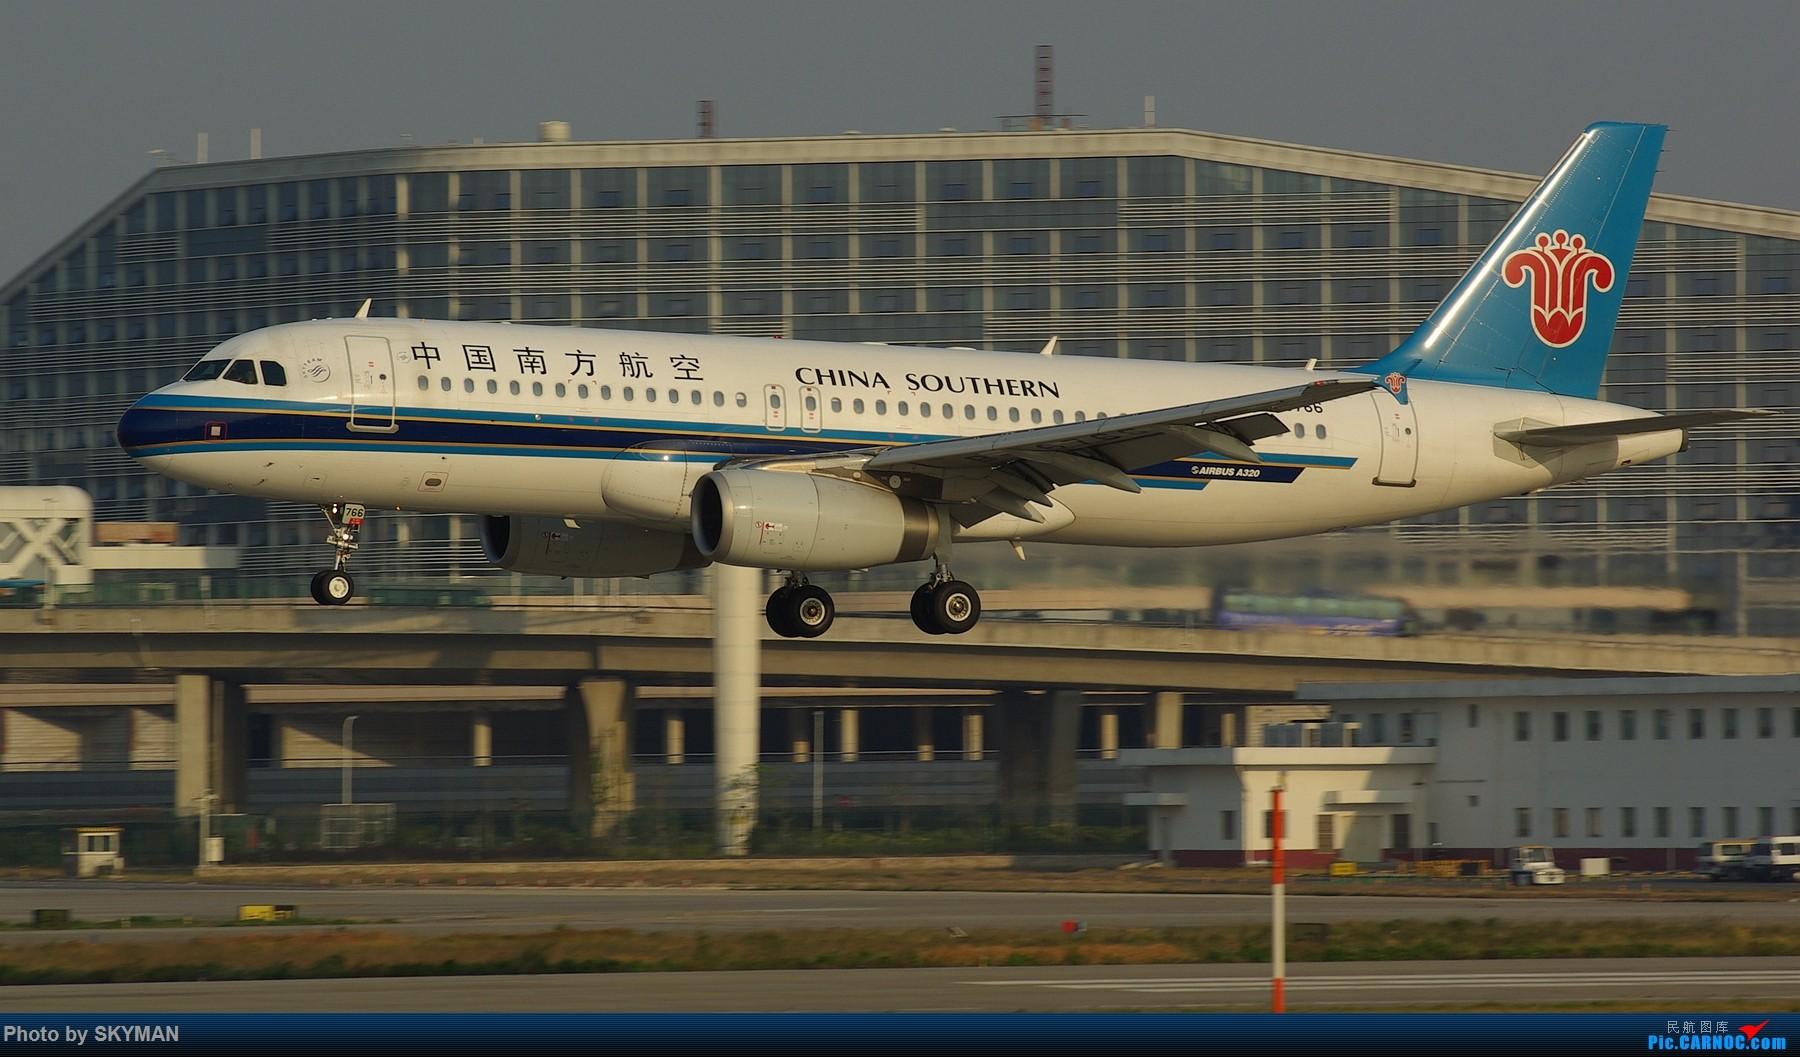 Re:[原创]BLDDQ---内痕么 以目前的形式靠打工实在是揭不开锅了 各位爷列为亲看着意思点啊 别控制 可是今天下午刚出炉的 绝对新鲜热乎 AIRBUS A320-200 B-6766 中国深圳宝安国际机场